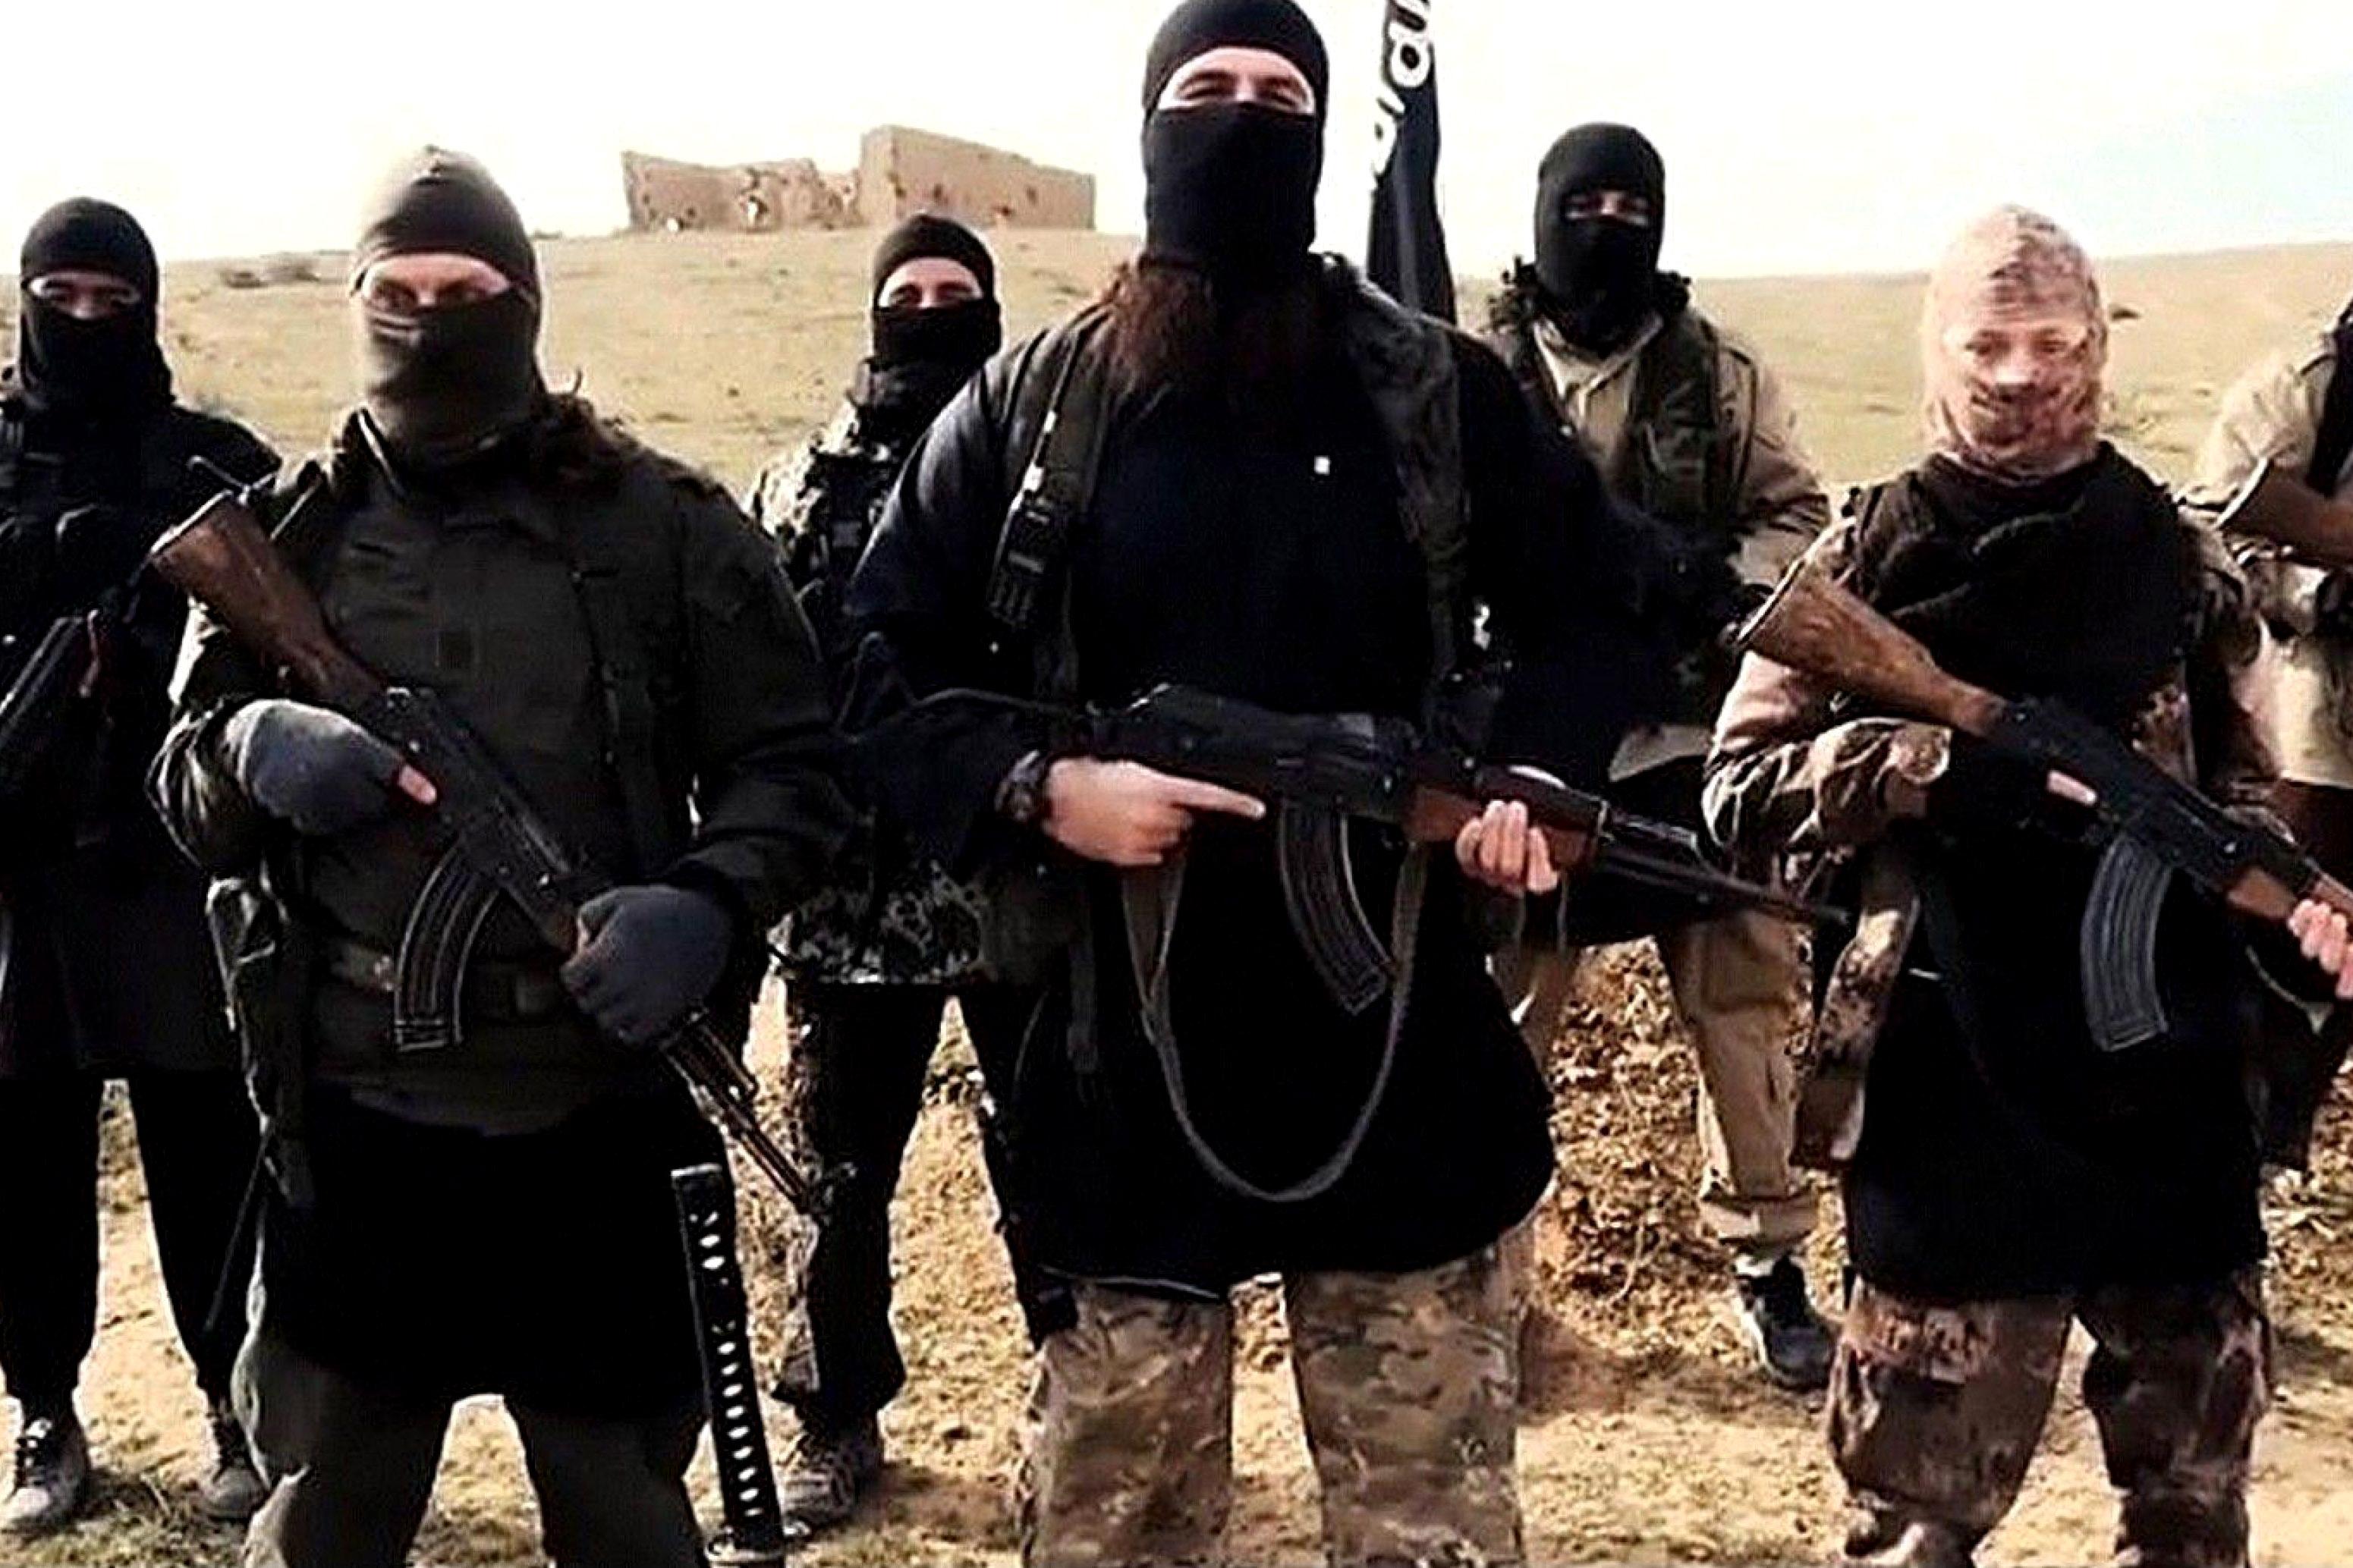 ПНС Ливии пришел конец: террористы Сирии разрушили авторитет правительства Сарраджа